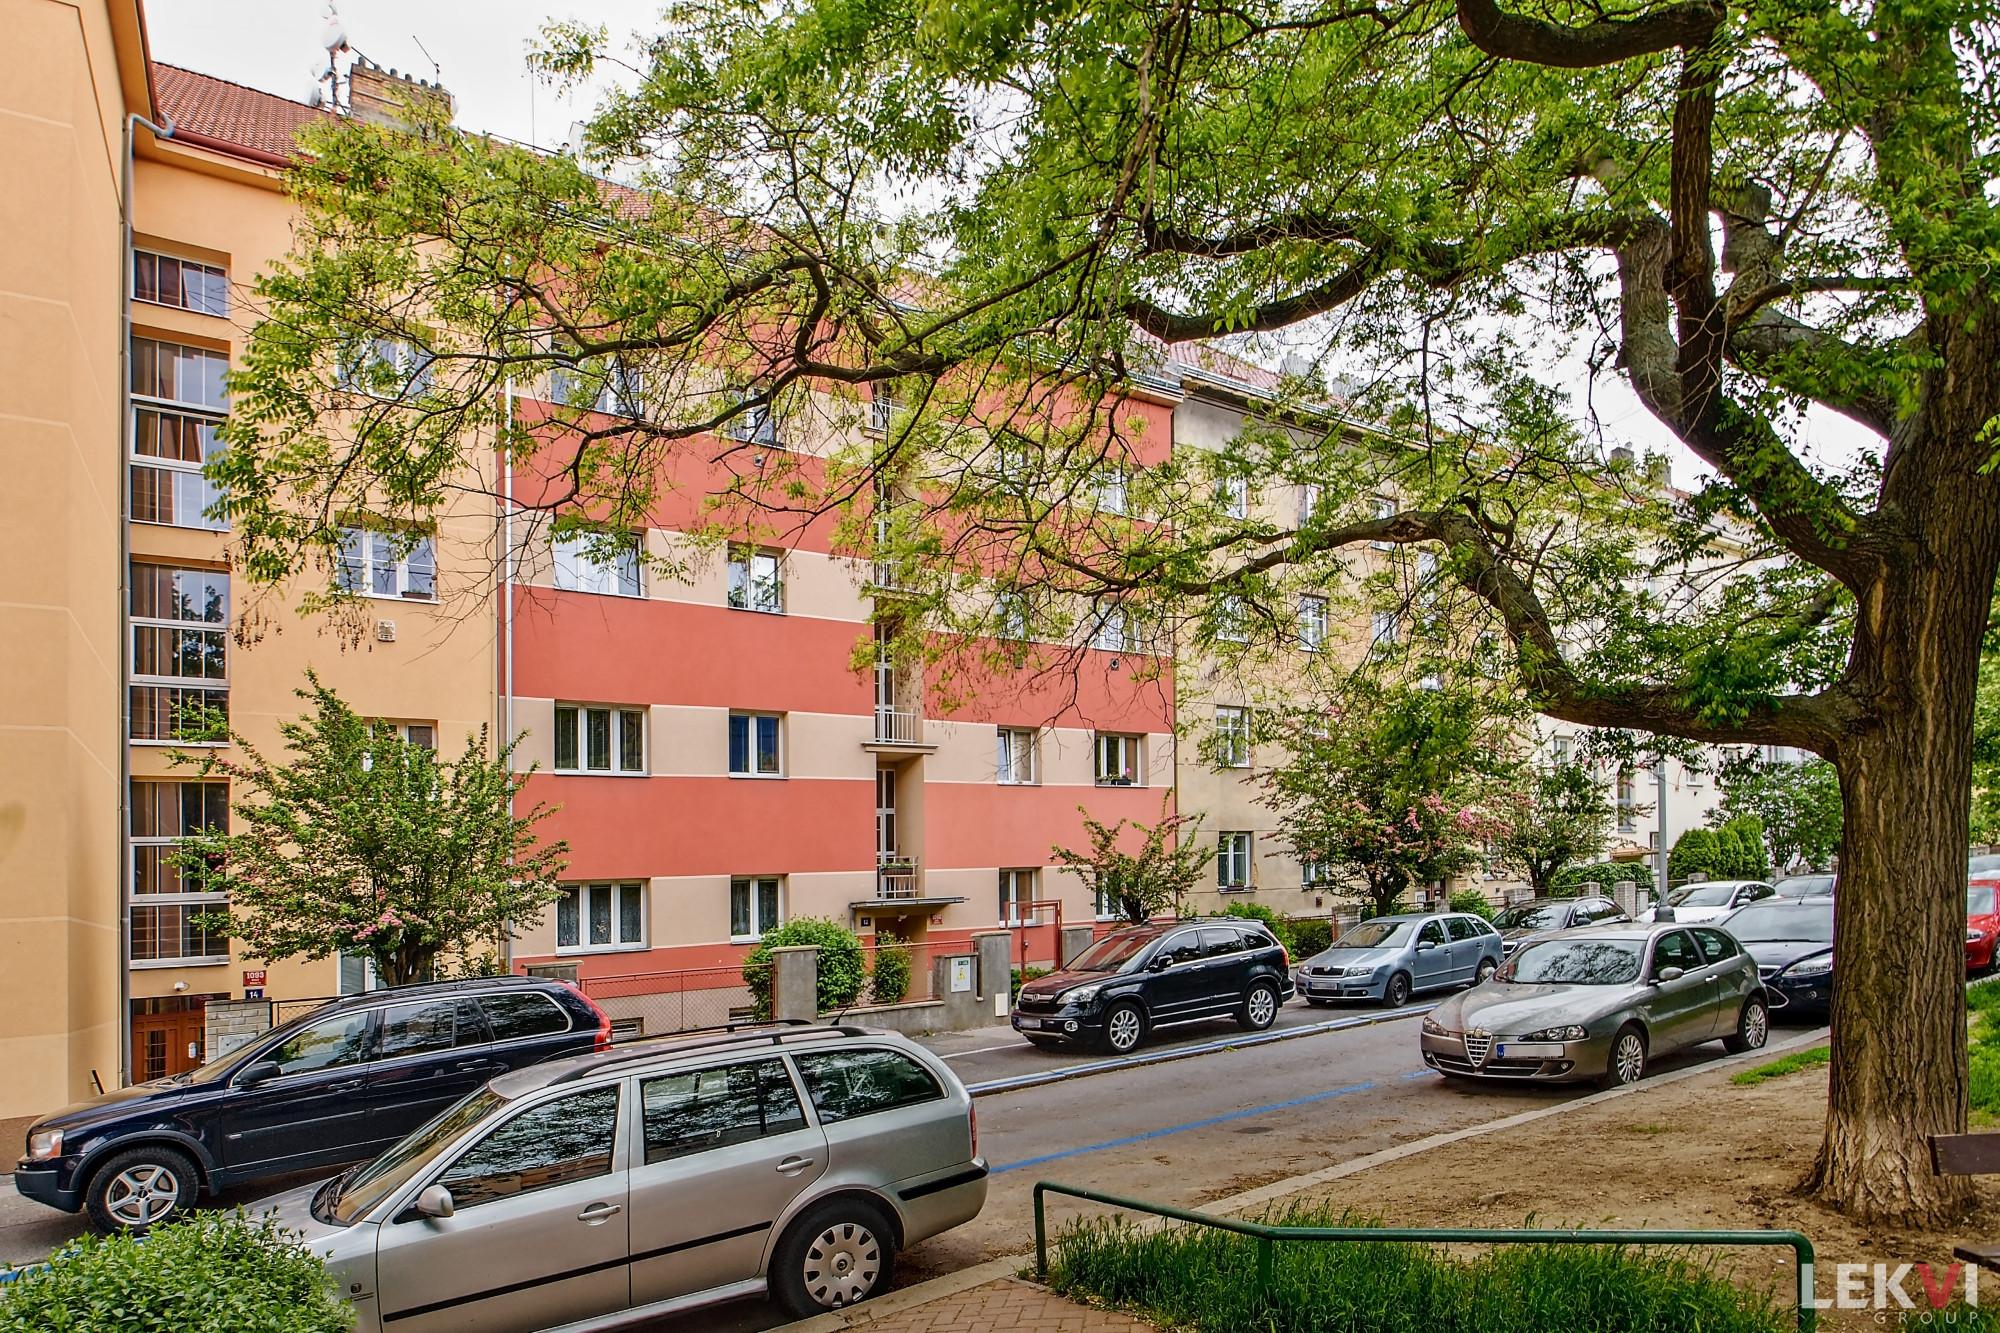 Prodej bytu 2+kk, 45 m2 - U družstva Ideál, Praha 4